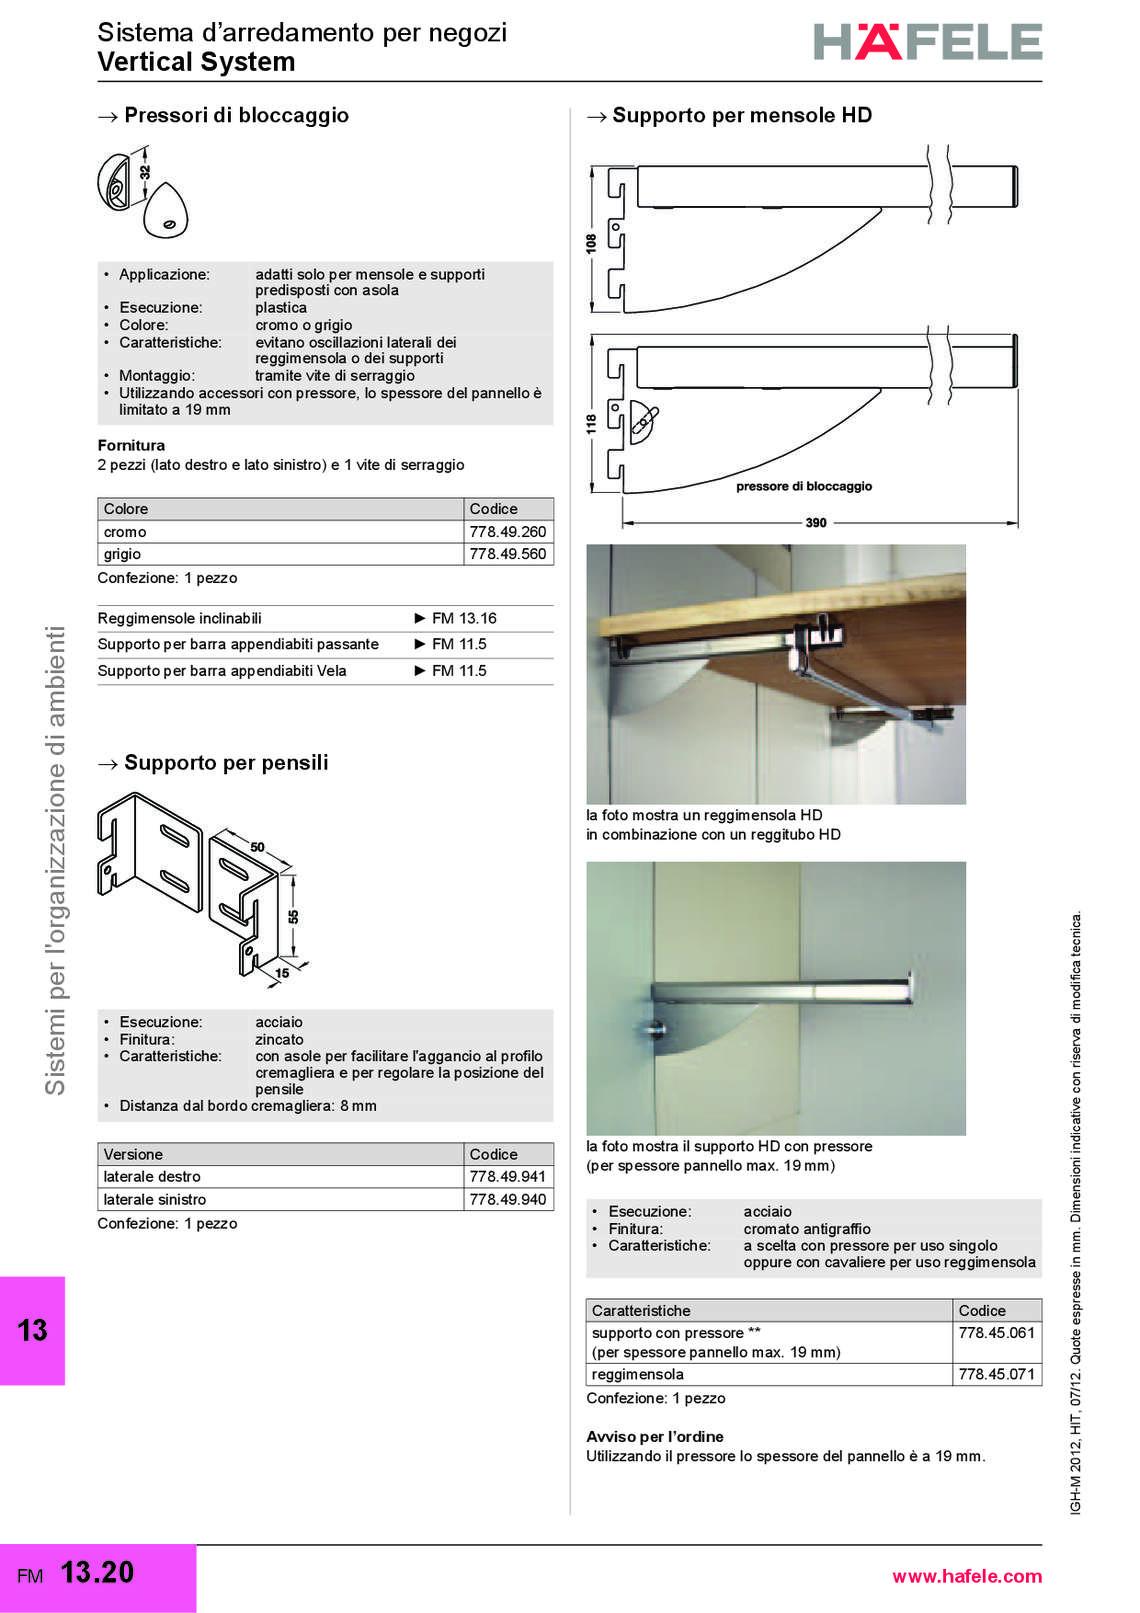 hafele-arredo-negozi-e-farmacie_32_031.jpg